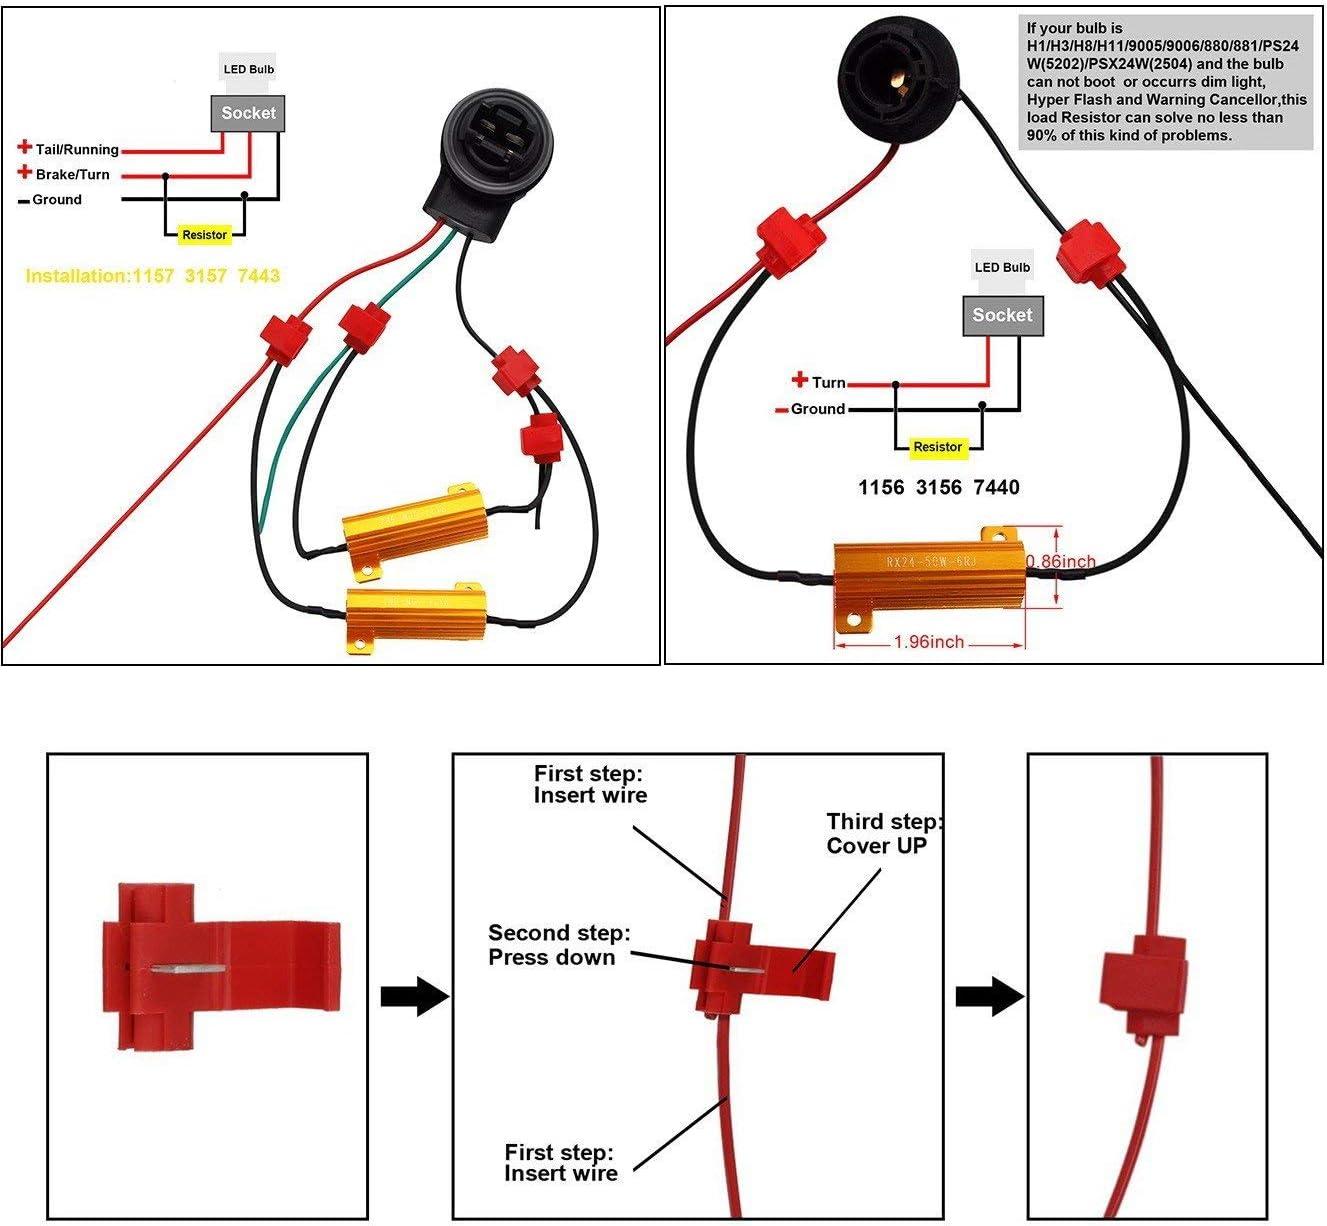 amazon.com: hocolo 3157 3057 3155 3357 3457 4057 4114 4157 3056 3156 led  resistor kit relay harness adapter anti flicker error decoder warning  canceller (2pcs 3157-resistor decoder): automotive  amazon.com